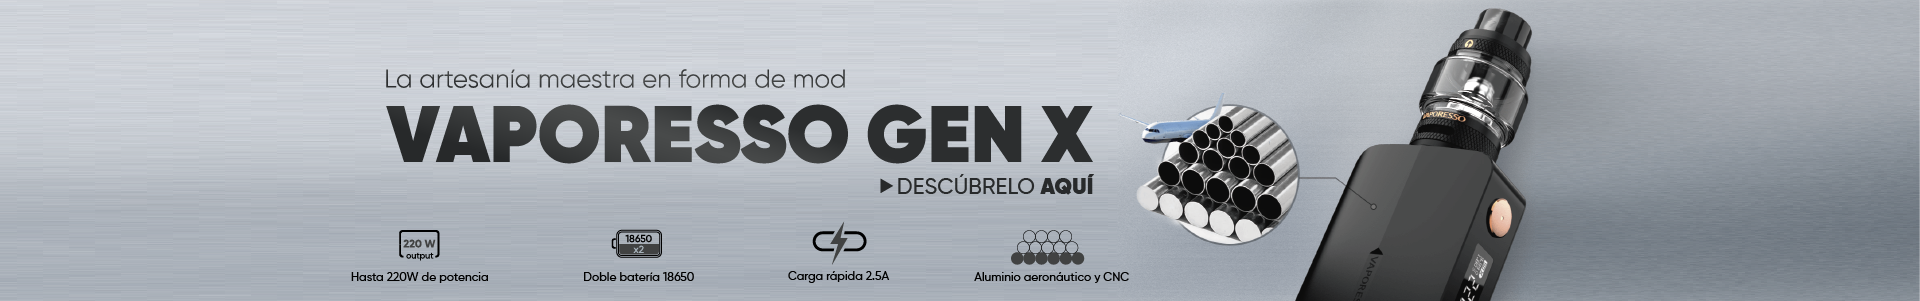 Nuevo Gen X de Vaporesso